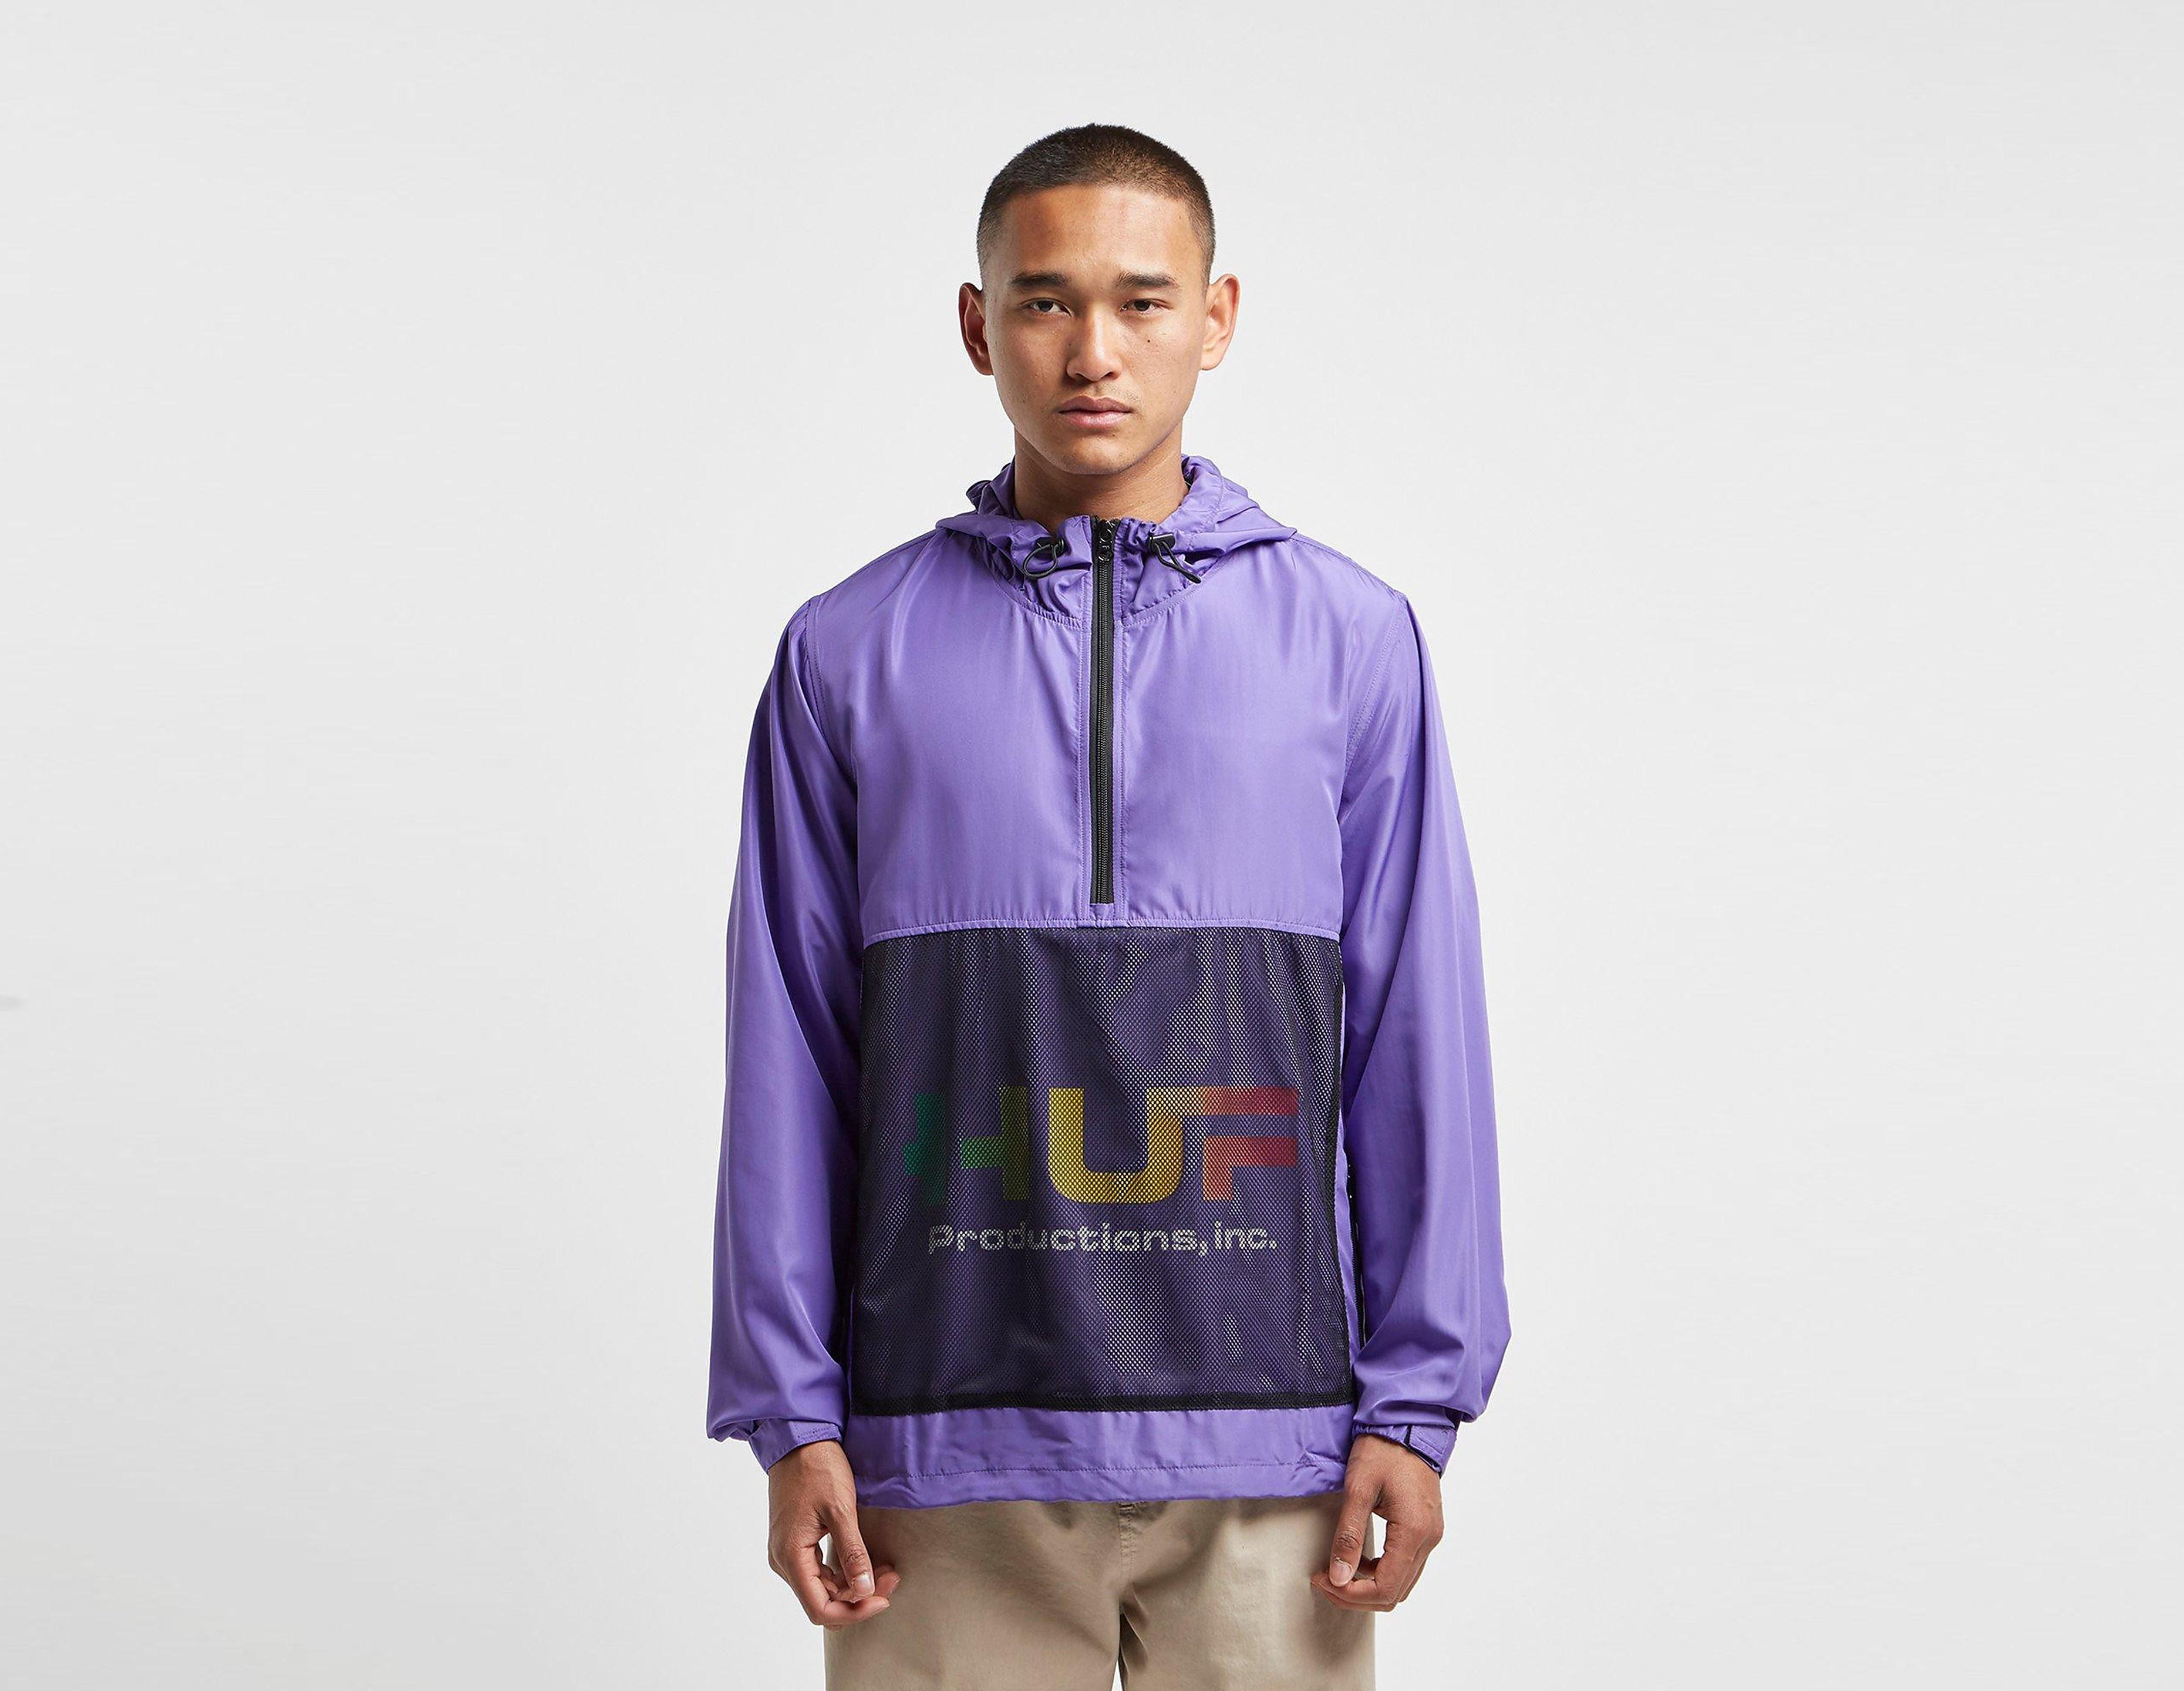 HUF Productions Inc Anorak Jacket, Viola